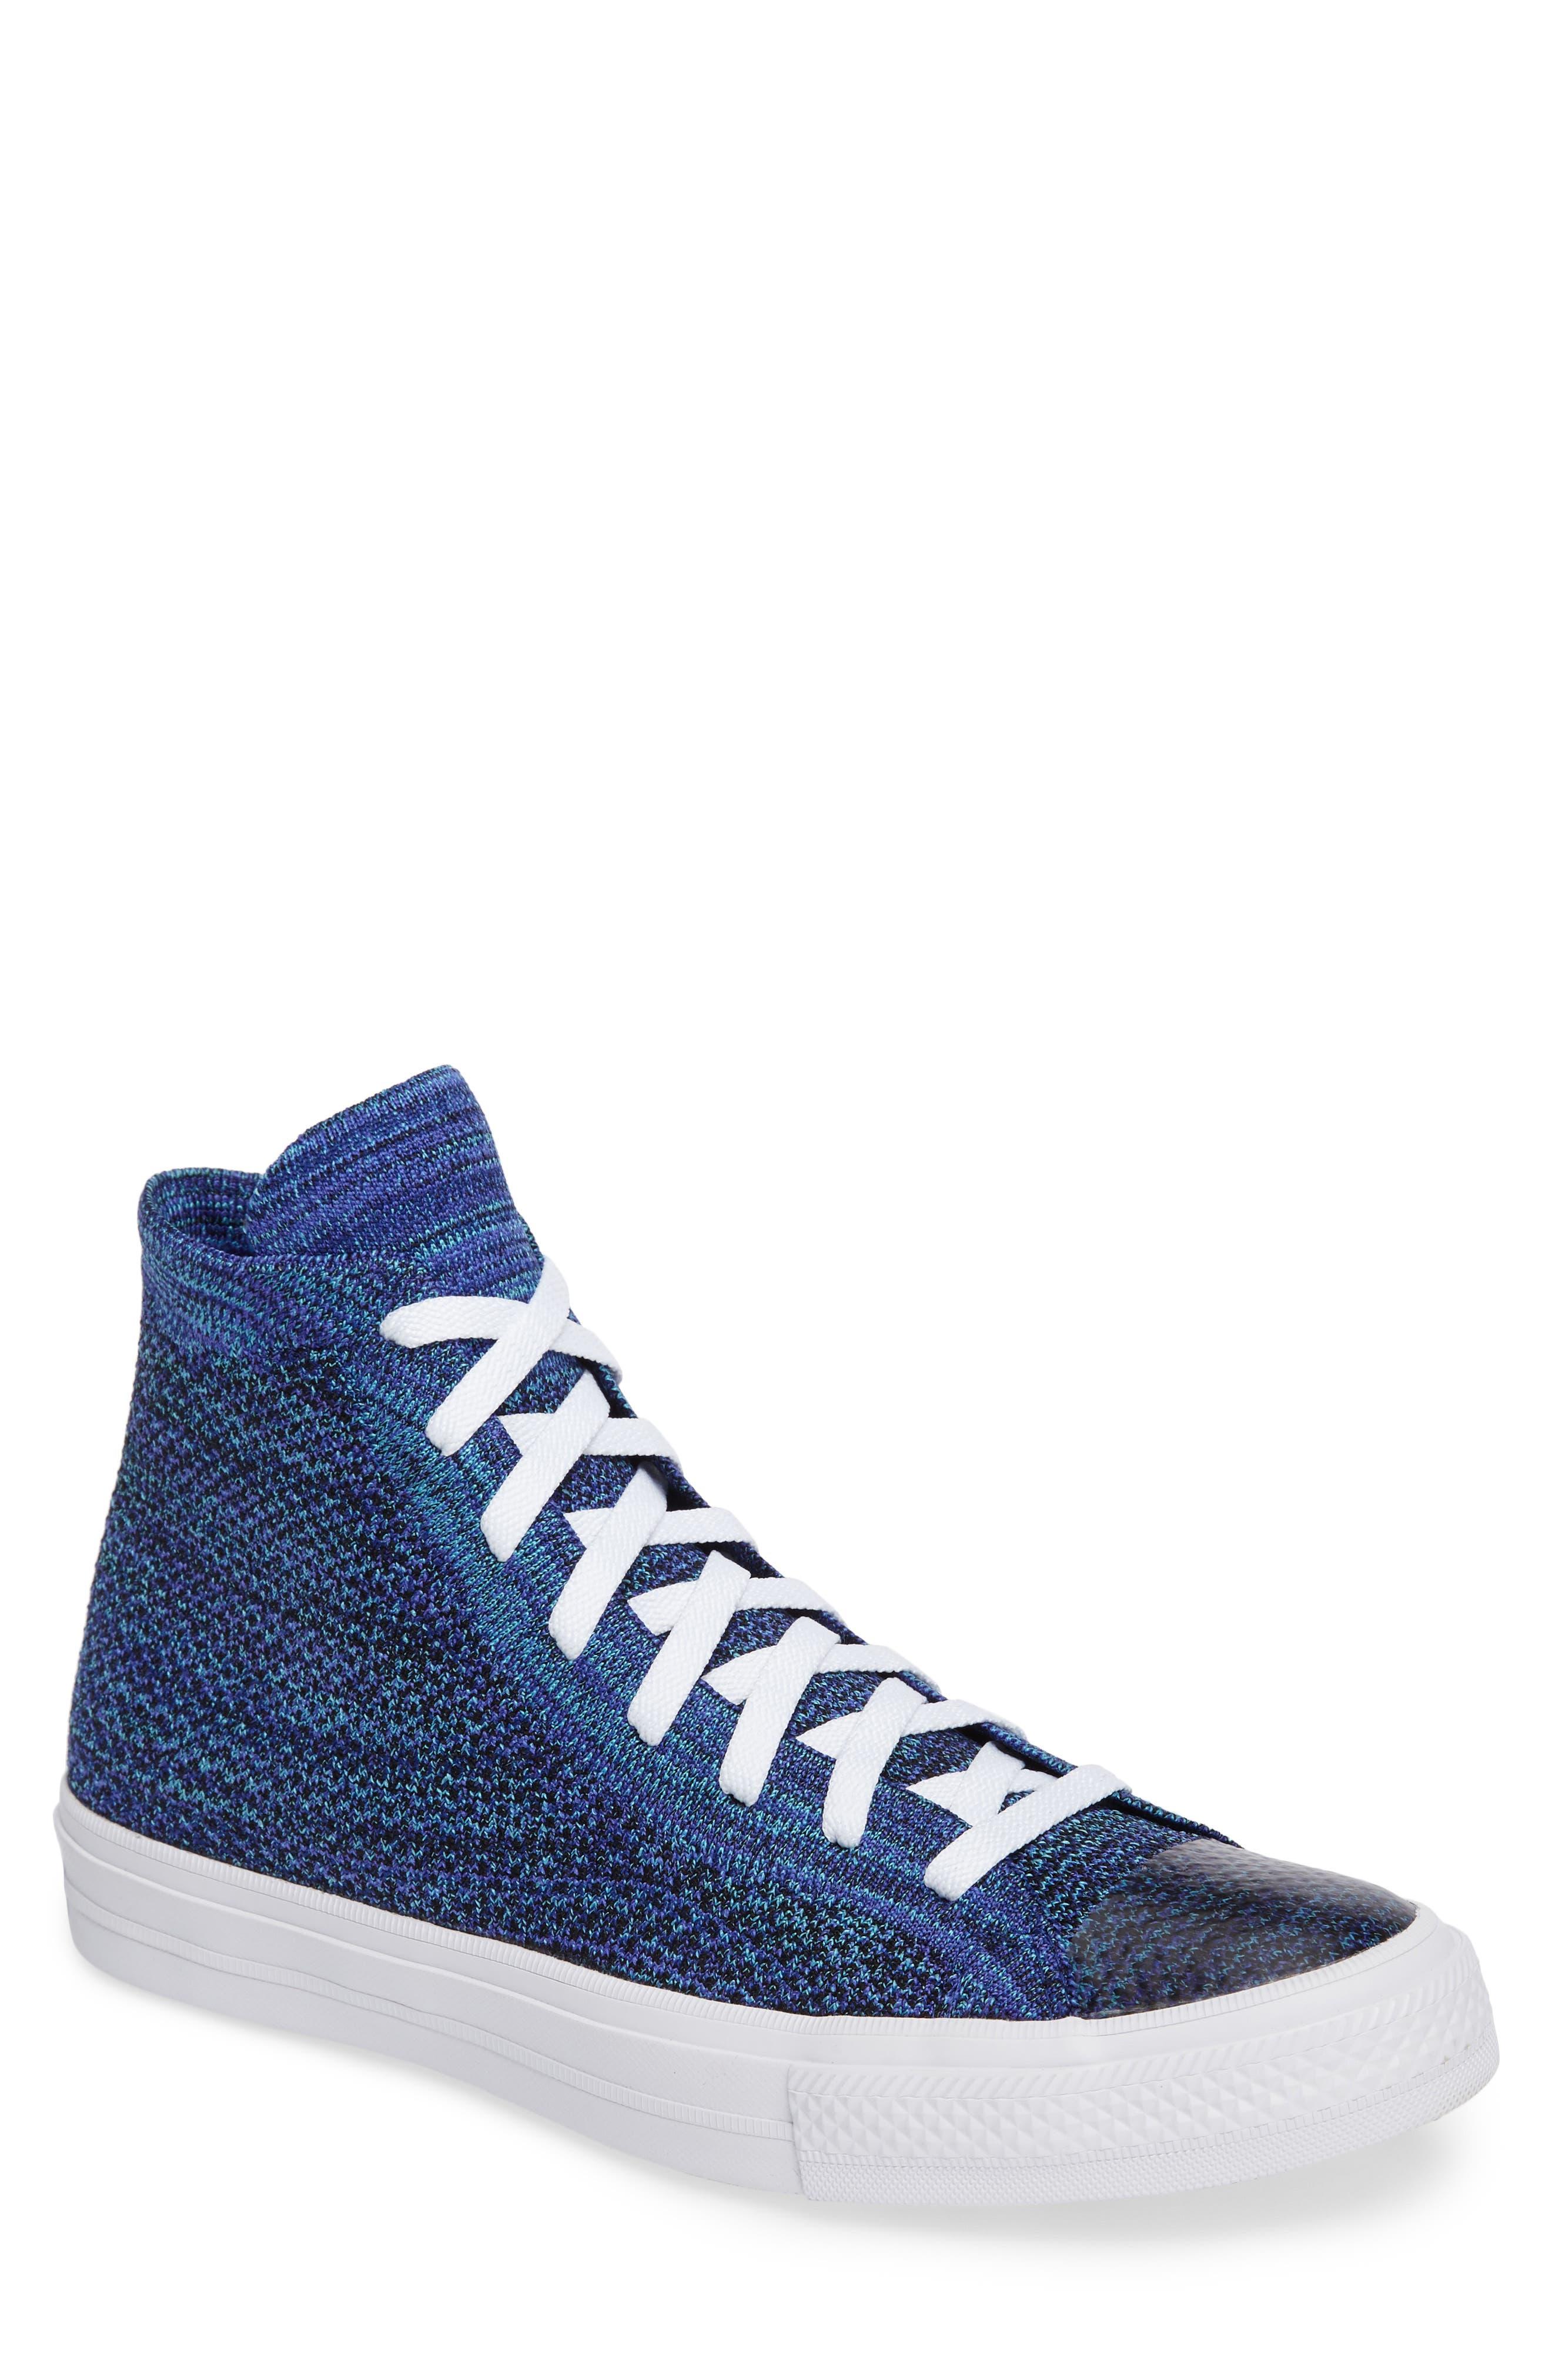 Chuck Taylor<sup>®</sup> All Star<sup>®</sup> Flyknit Hi Sneaker,                         Main,                         color, Indigo